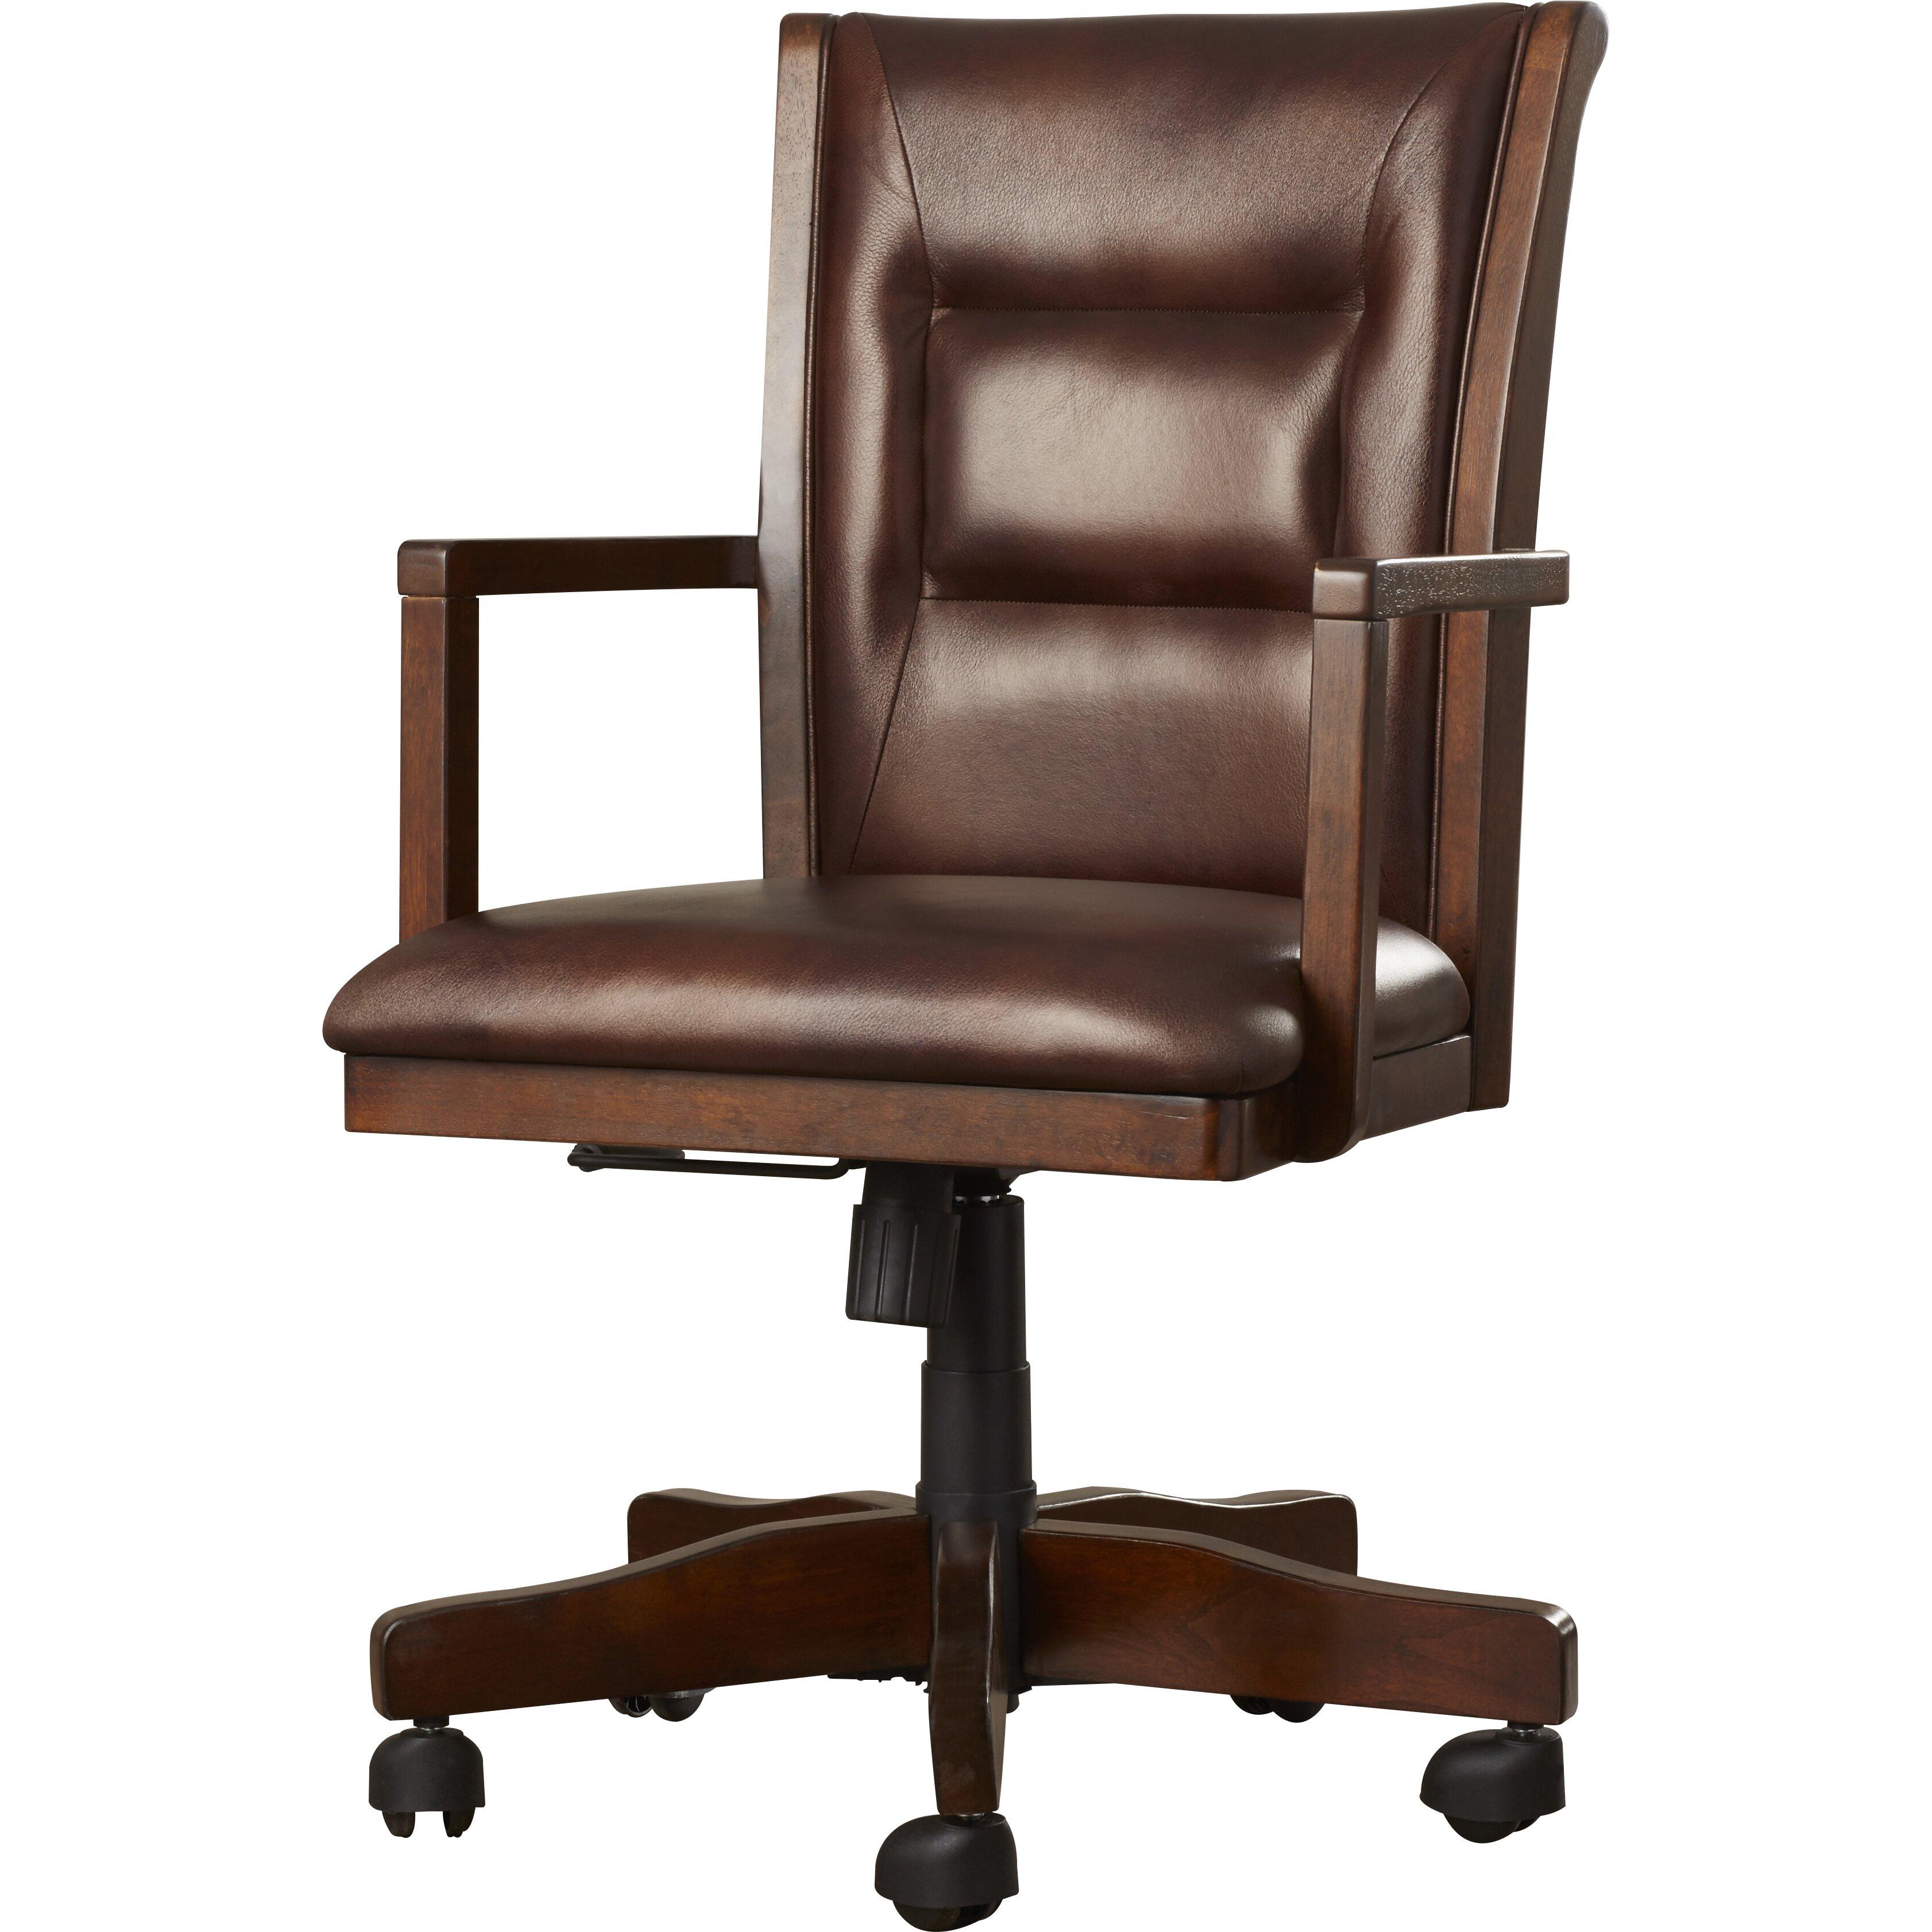 Darby Home Co Priscilla Desk Chair Reviews